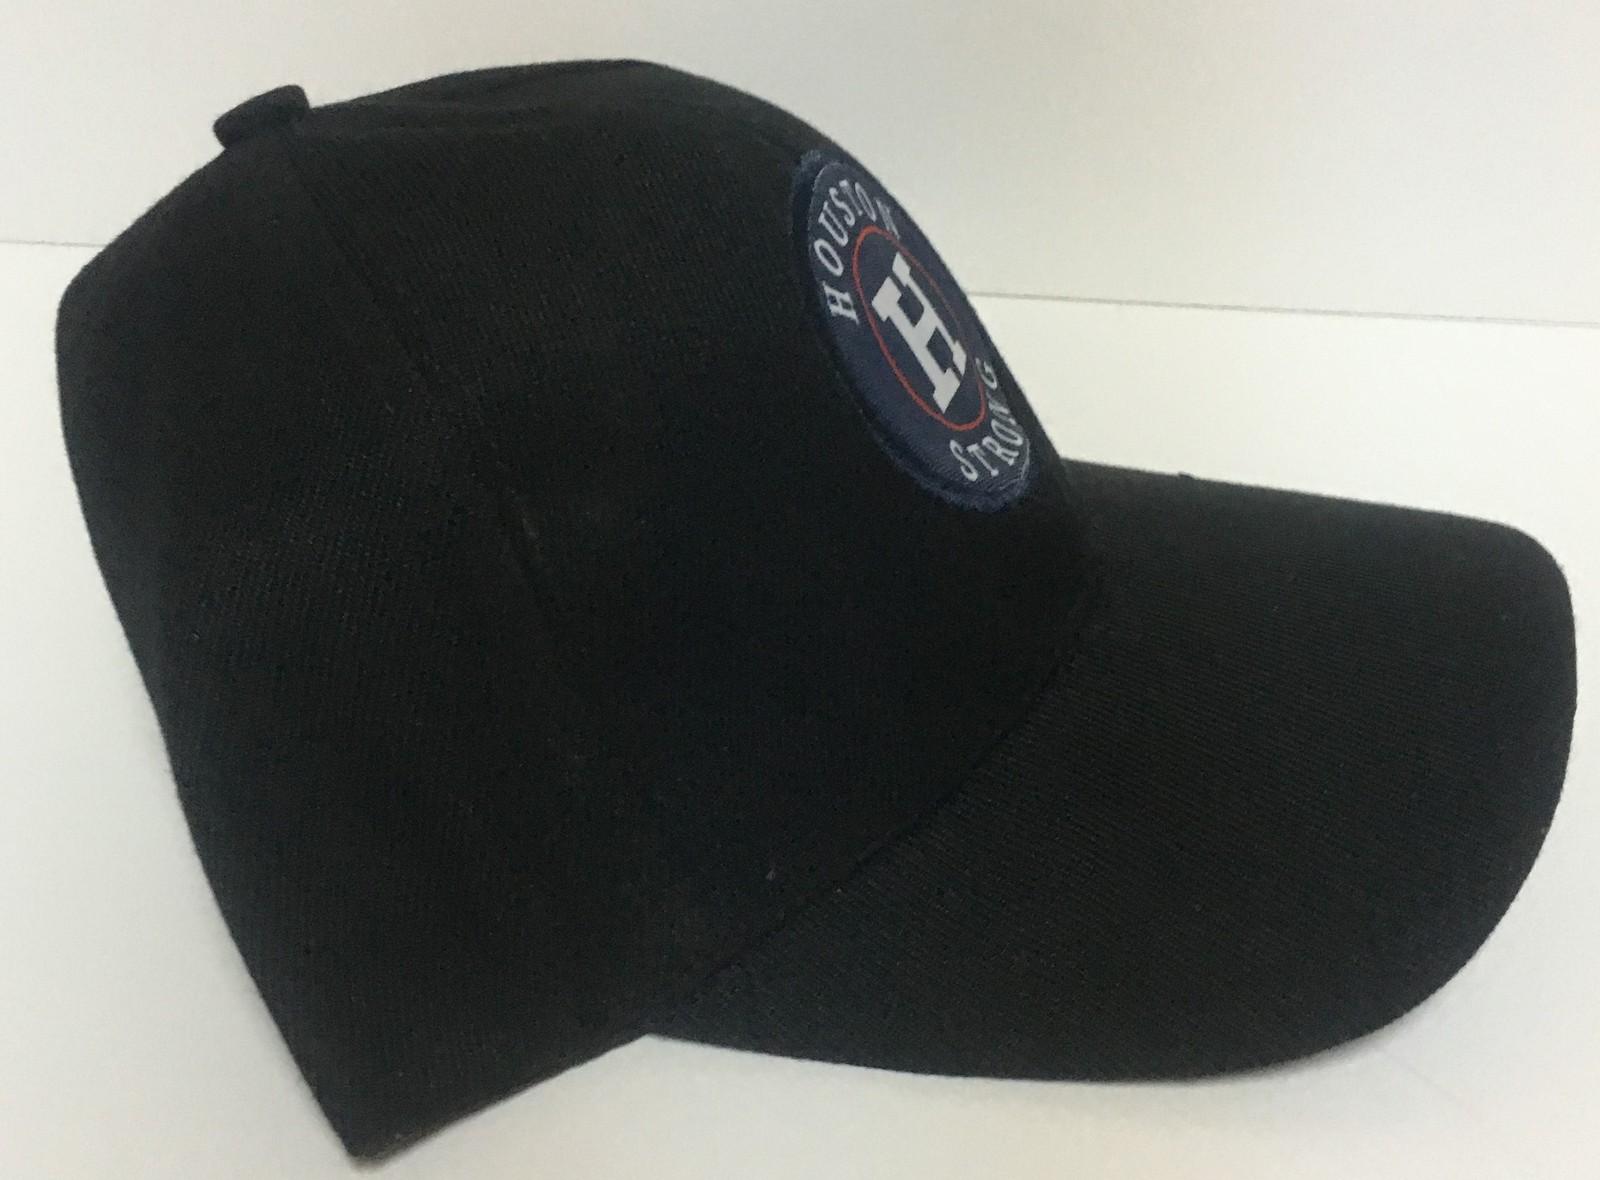 Houston Strong Black Base Ball Hat Cap Adult Size Adjustable